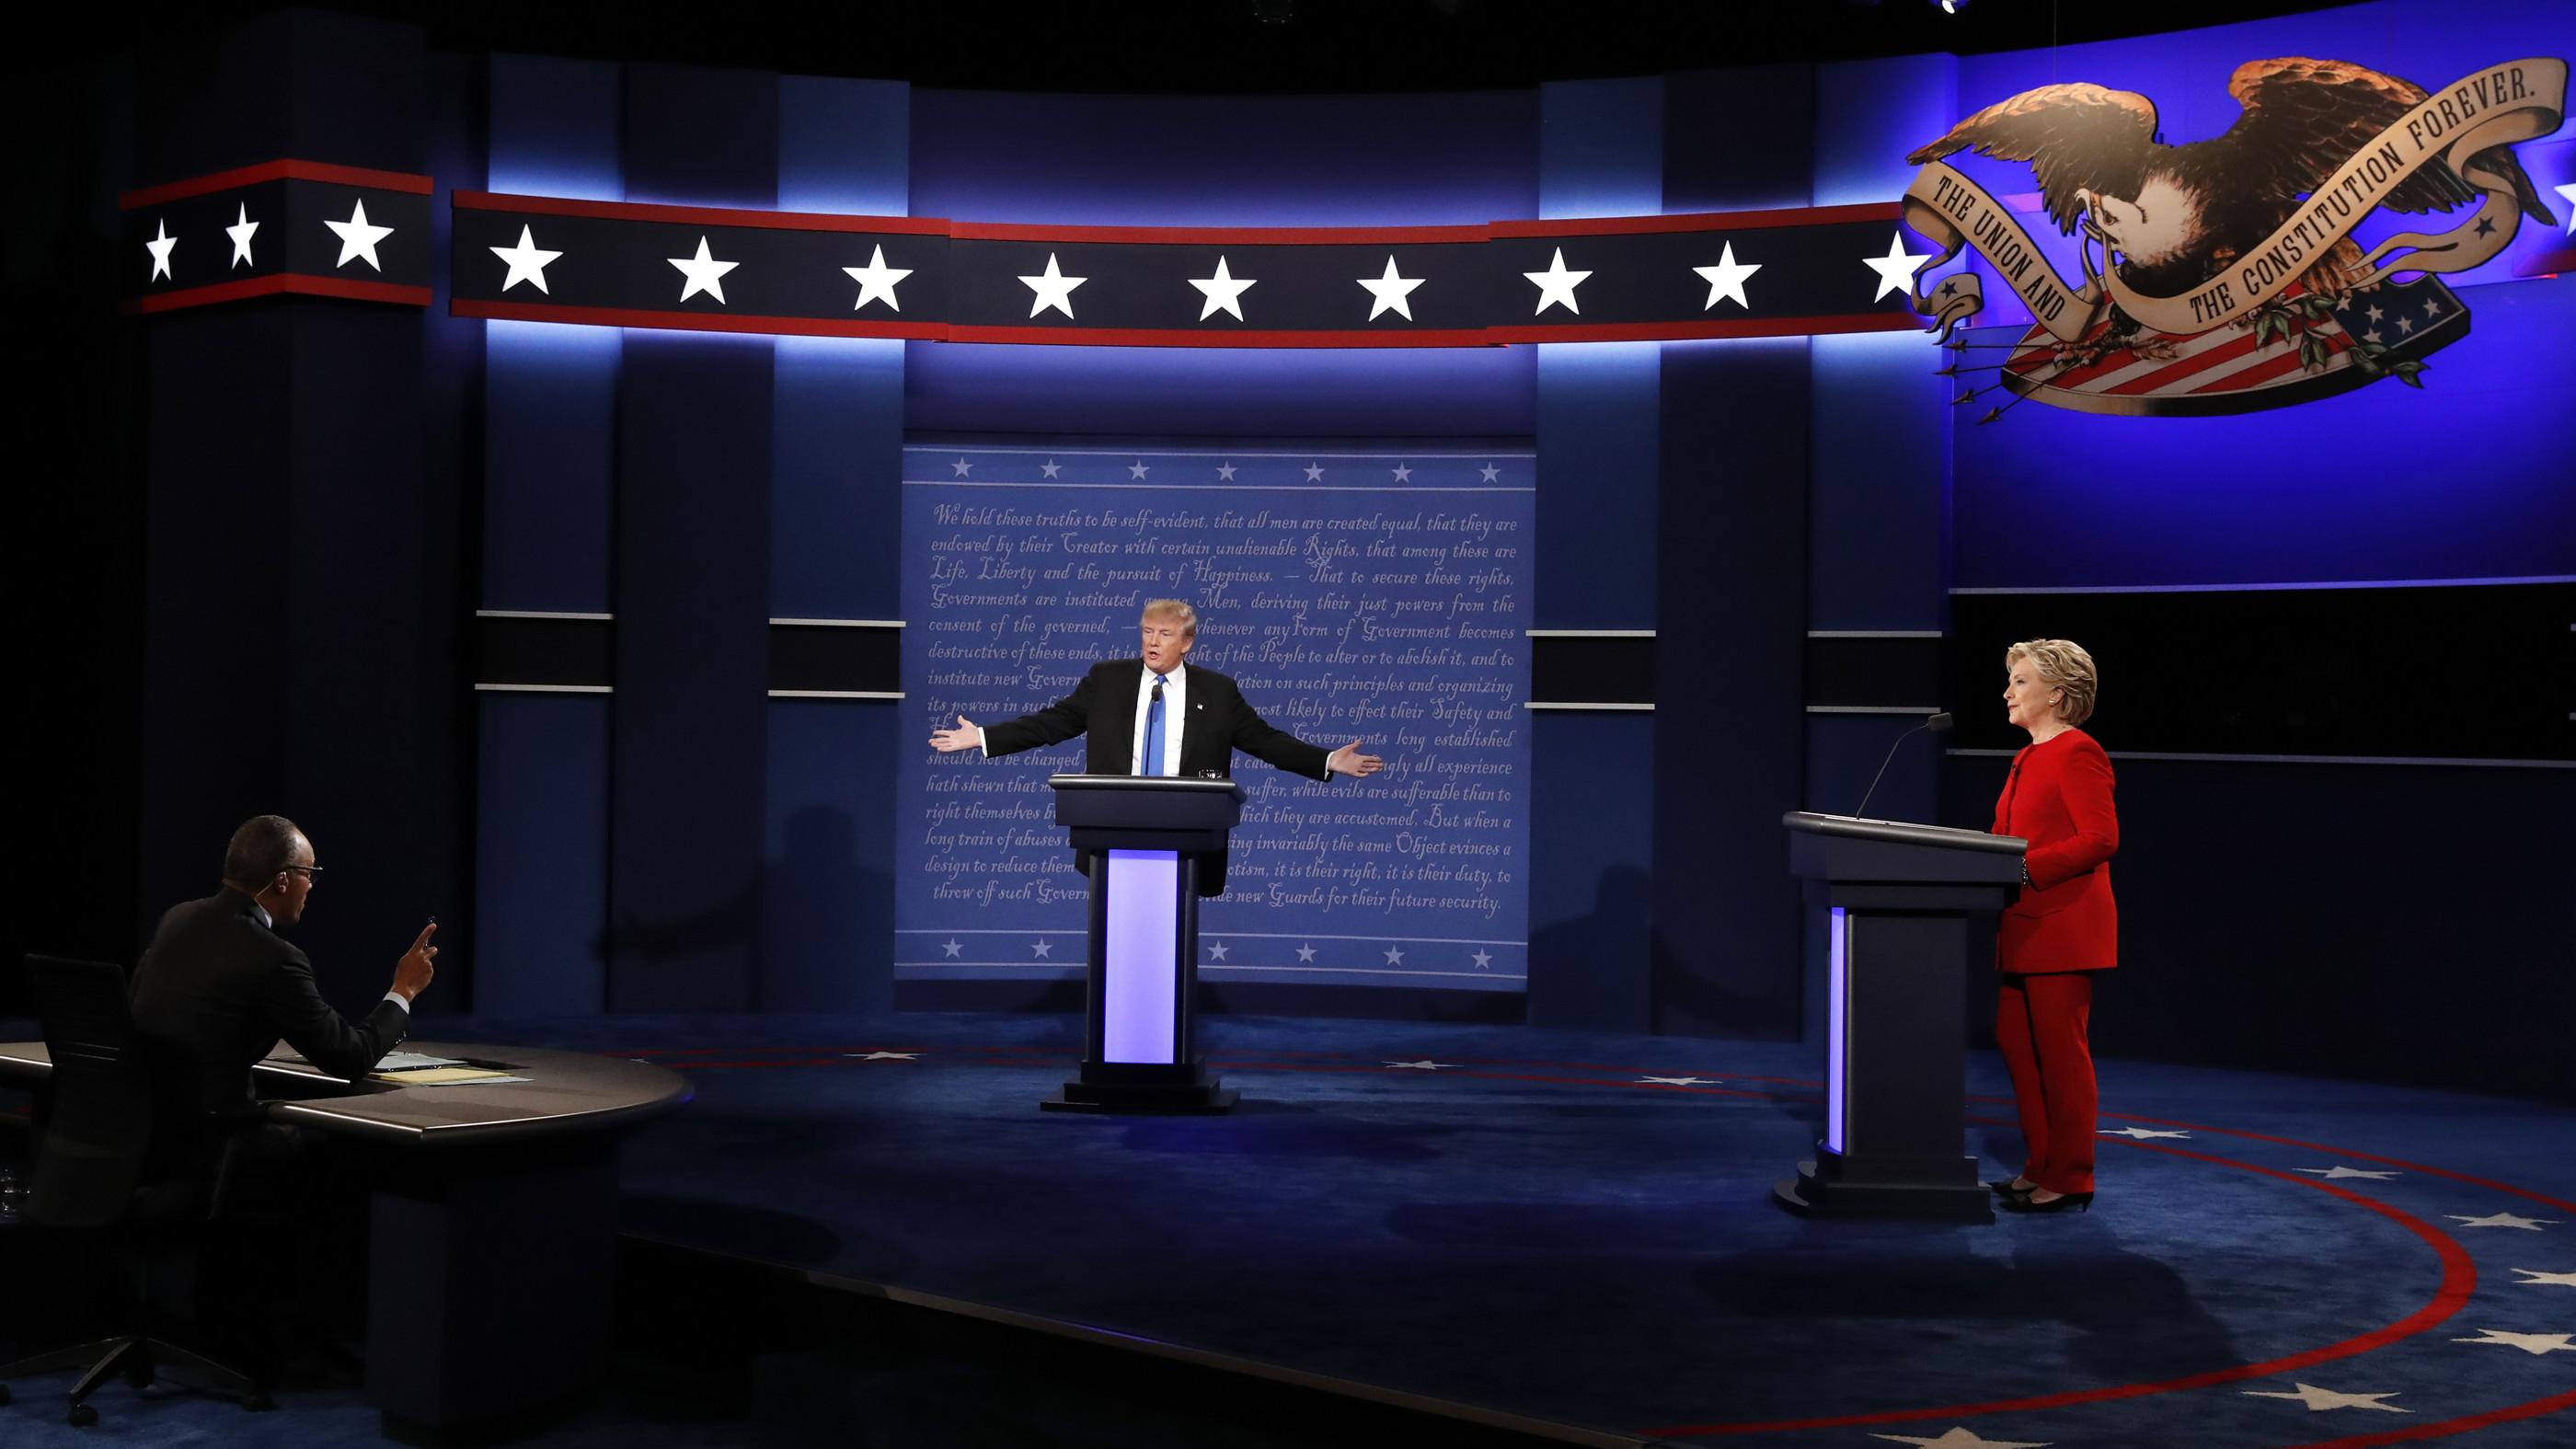 Republican U.S. presidential nominee Donald Trump speaks with debate host Lester Holt (L) as Democratic U.S. presidential nominee Hillary Clinton listens during their first presidential debate at Hofstra University in Hempstead, New York, U.S., September 26, 2016.